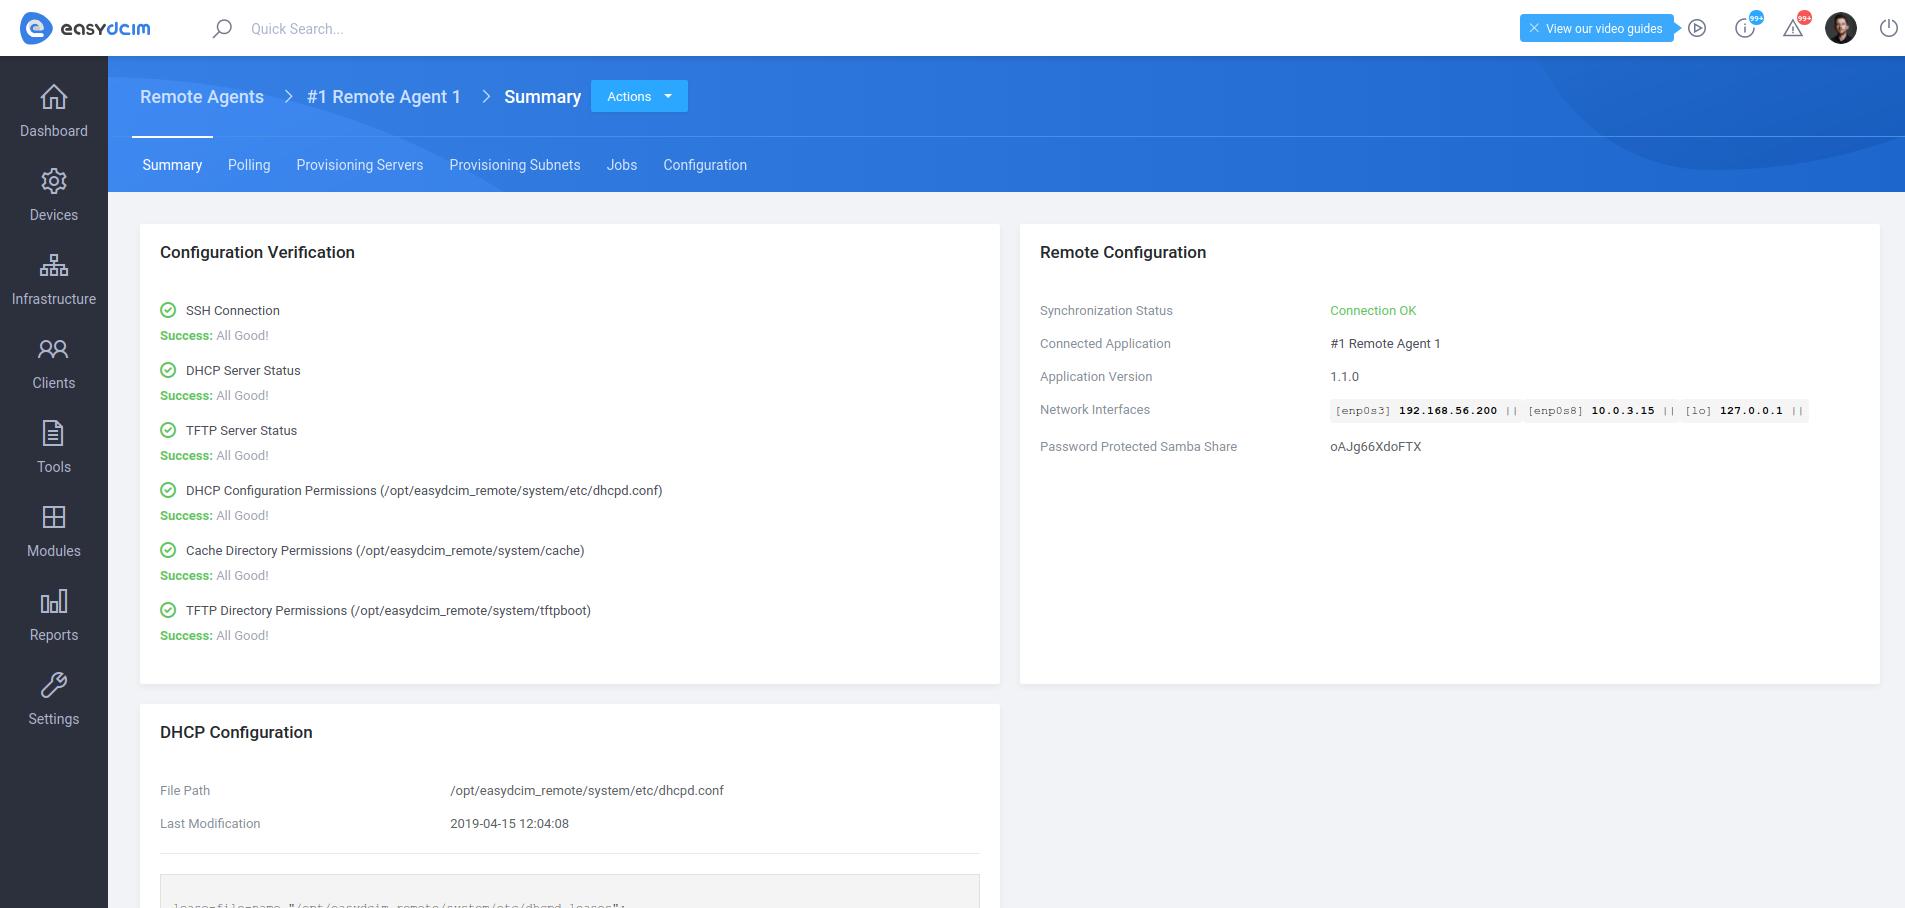 Remote Agent Summary - EasyDCIM v1.6.0